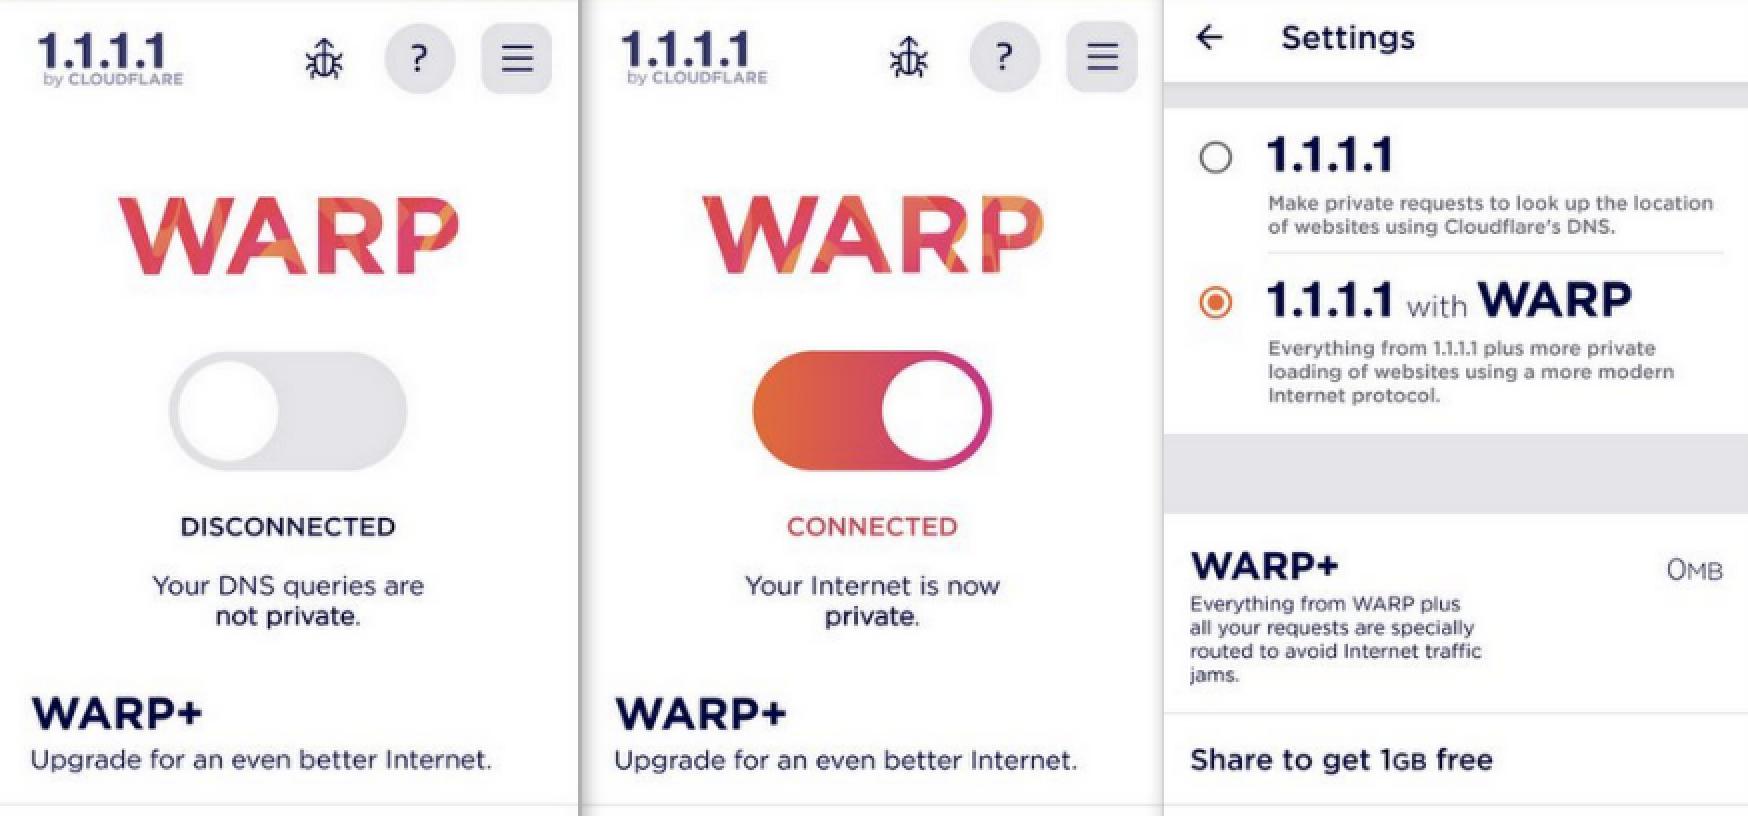 Cloudflare 免費 VPN 1.1.1.1. + Warp 終於推出,Android、iPhone 有 App 即時下載